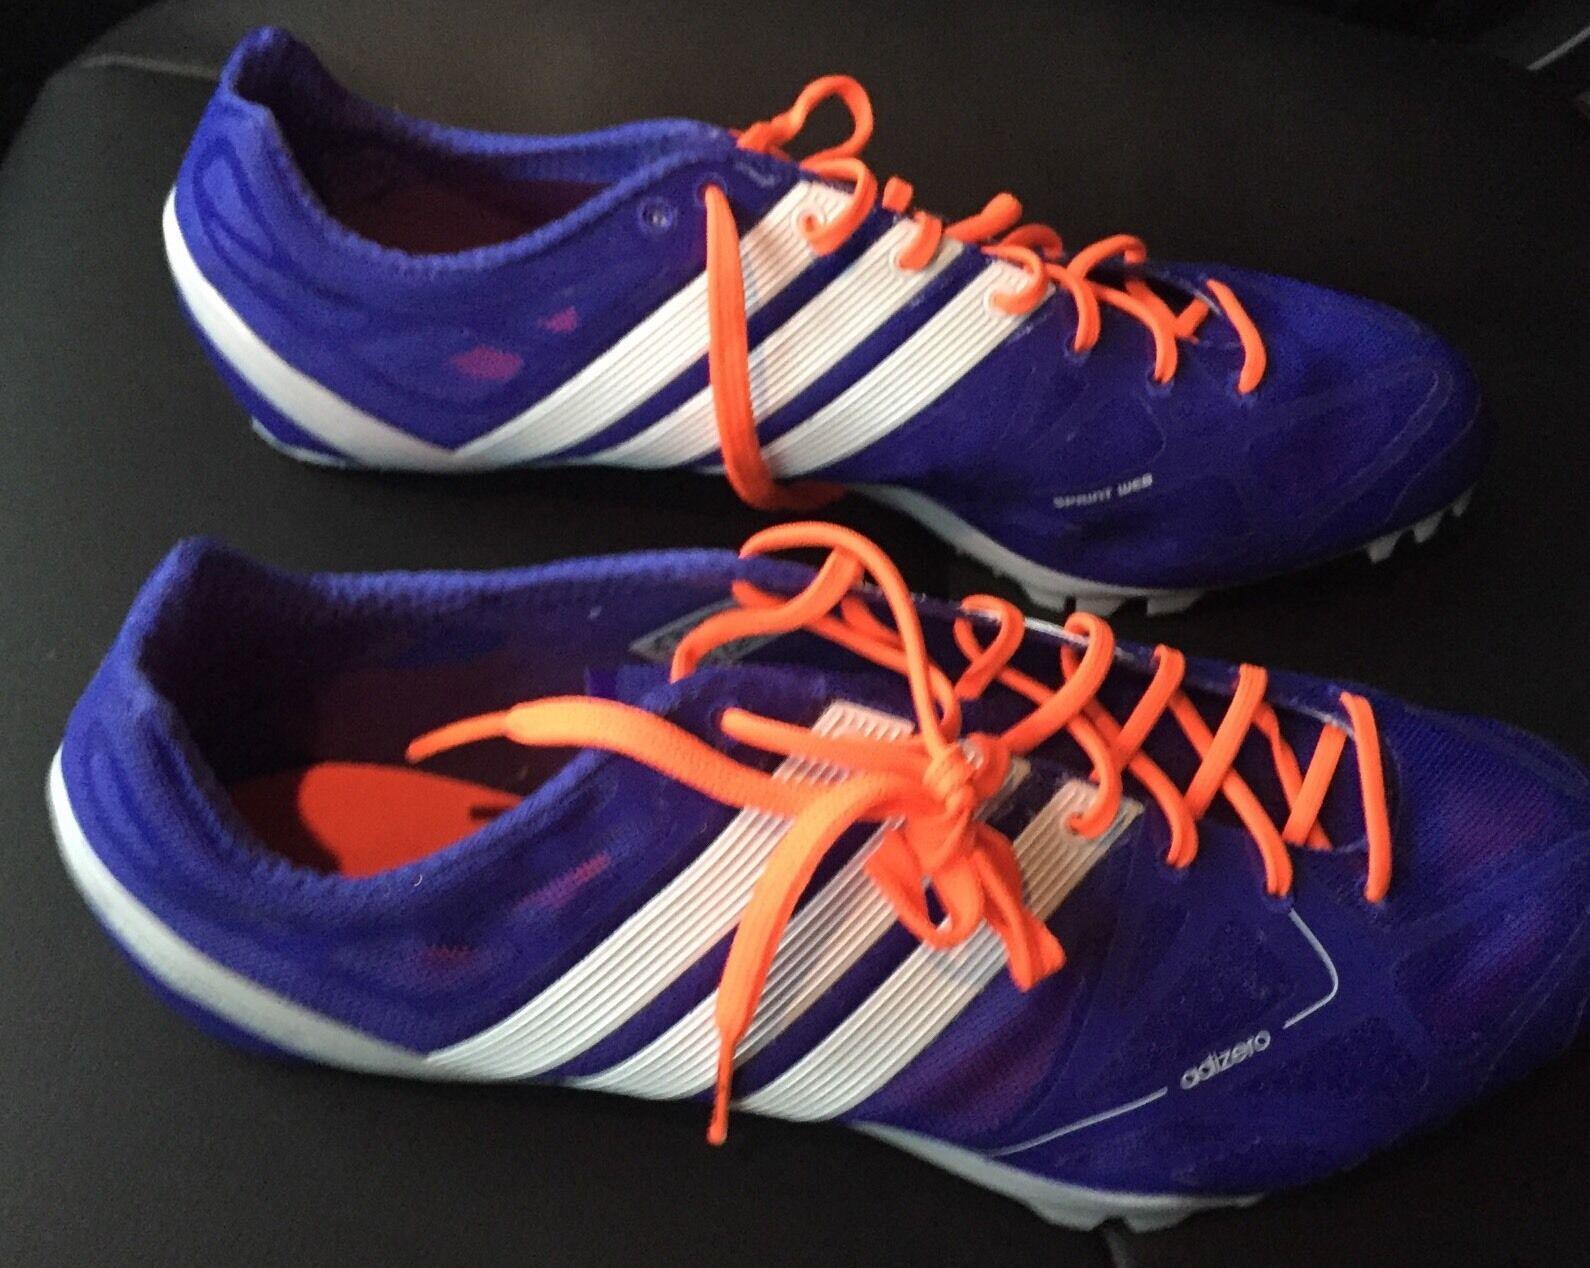 sports shoes 16519 d369f http   www.fmcgsouthindia.com szptfb-oqdlje-2270968.cgi https   i ...